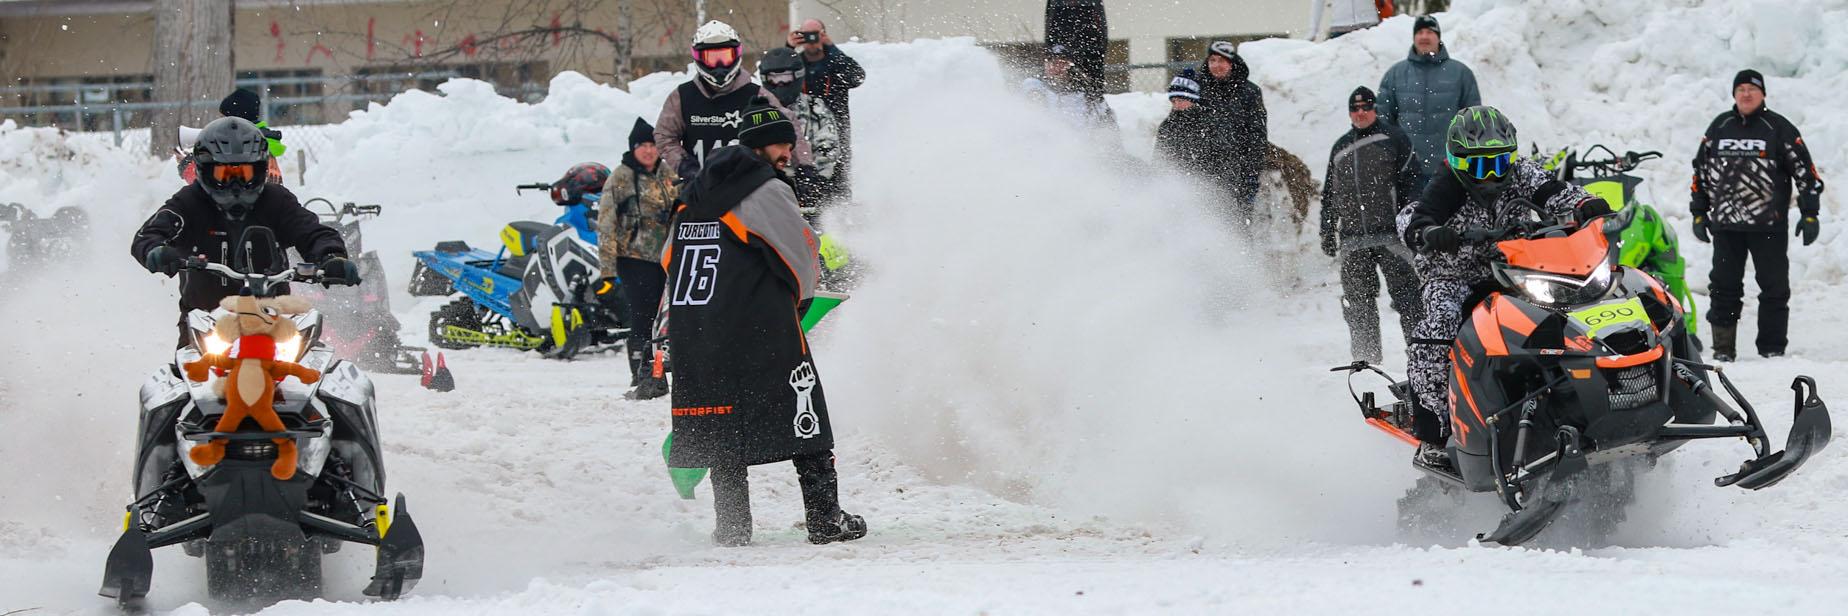 2nd Annual Turcotte Compound Snowarama Drag Race & Freestyle